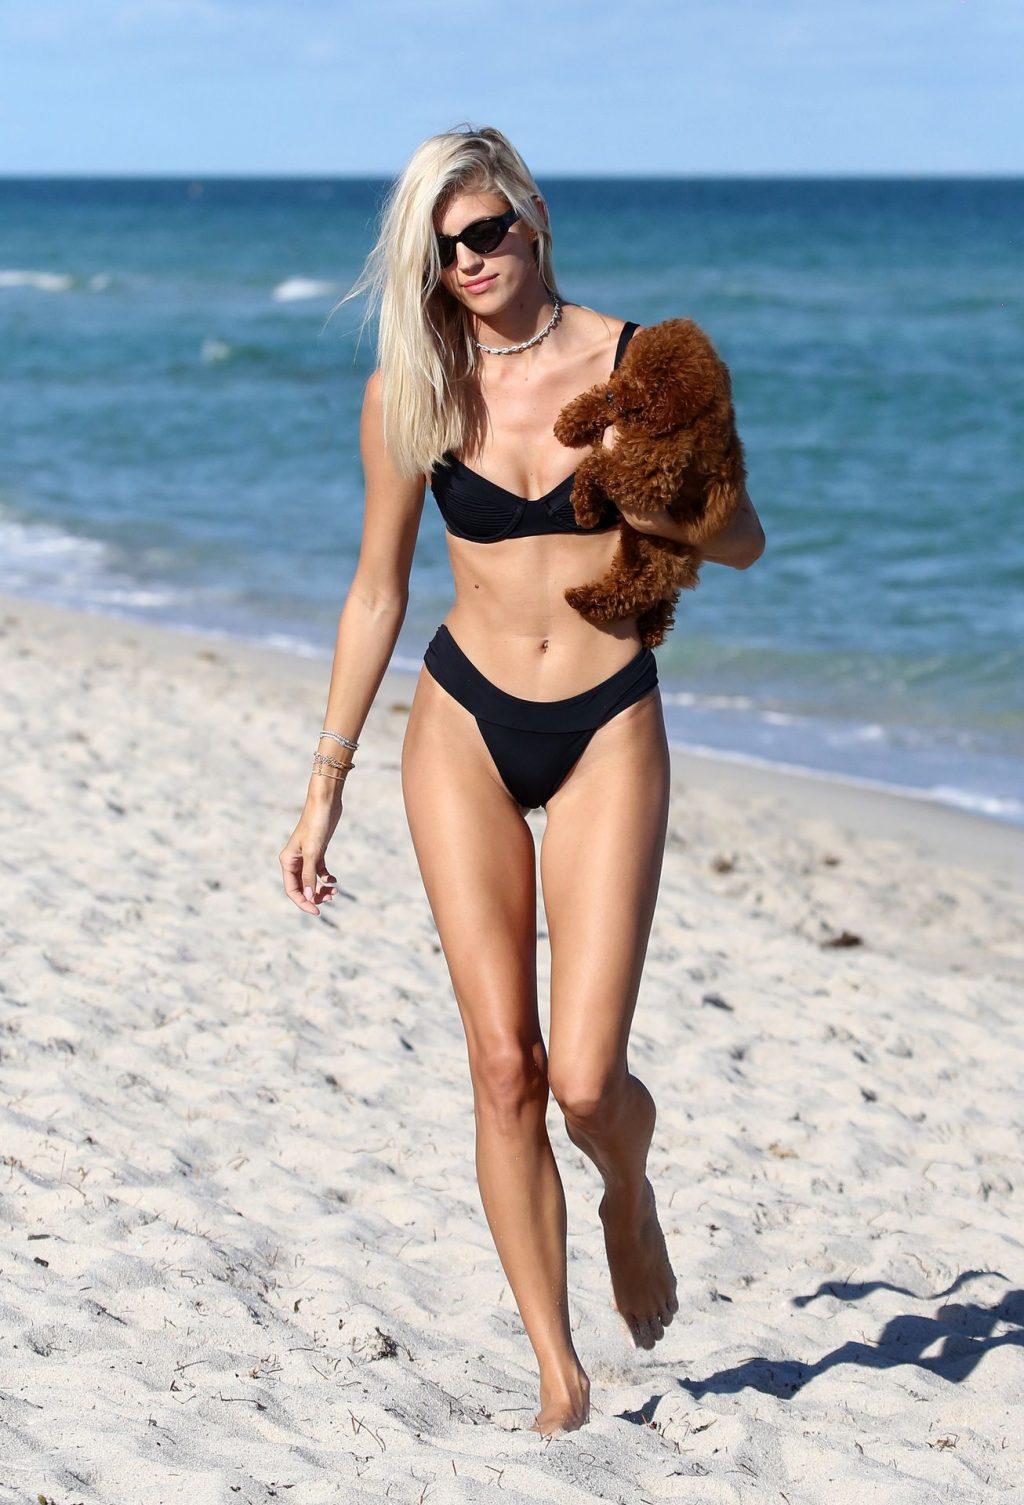 Sexy Model Devon Windsor Wears a Bikini at The Beach in Miami (20 Photos)